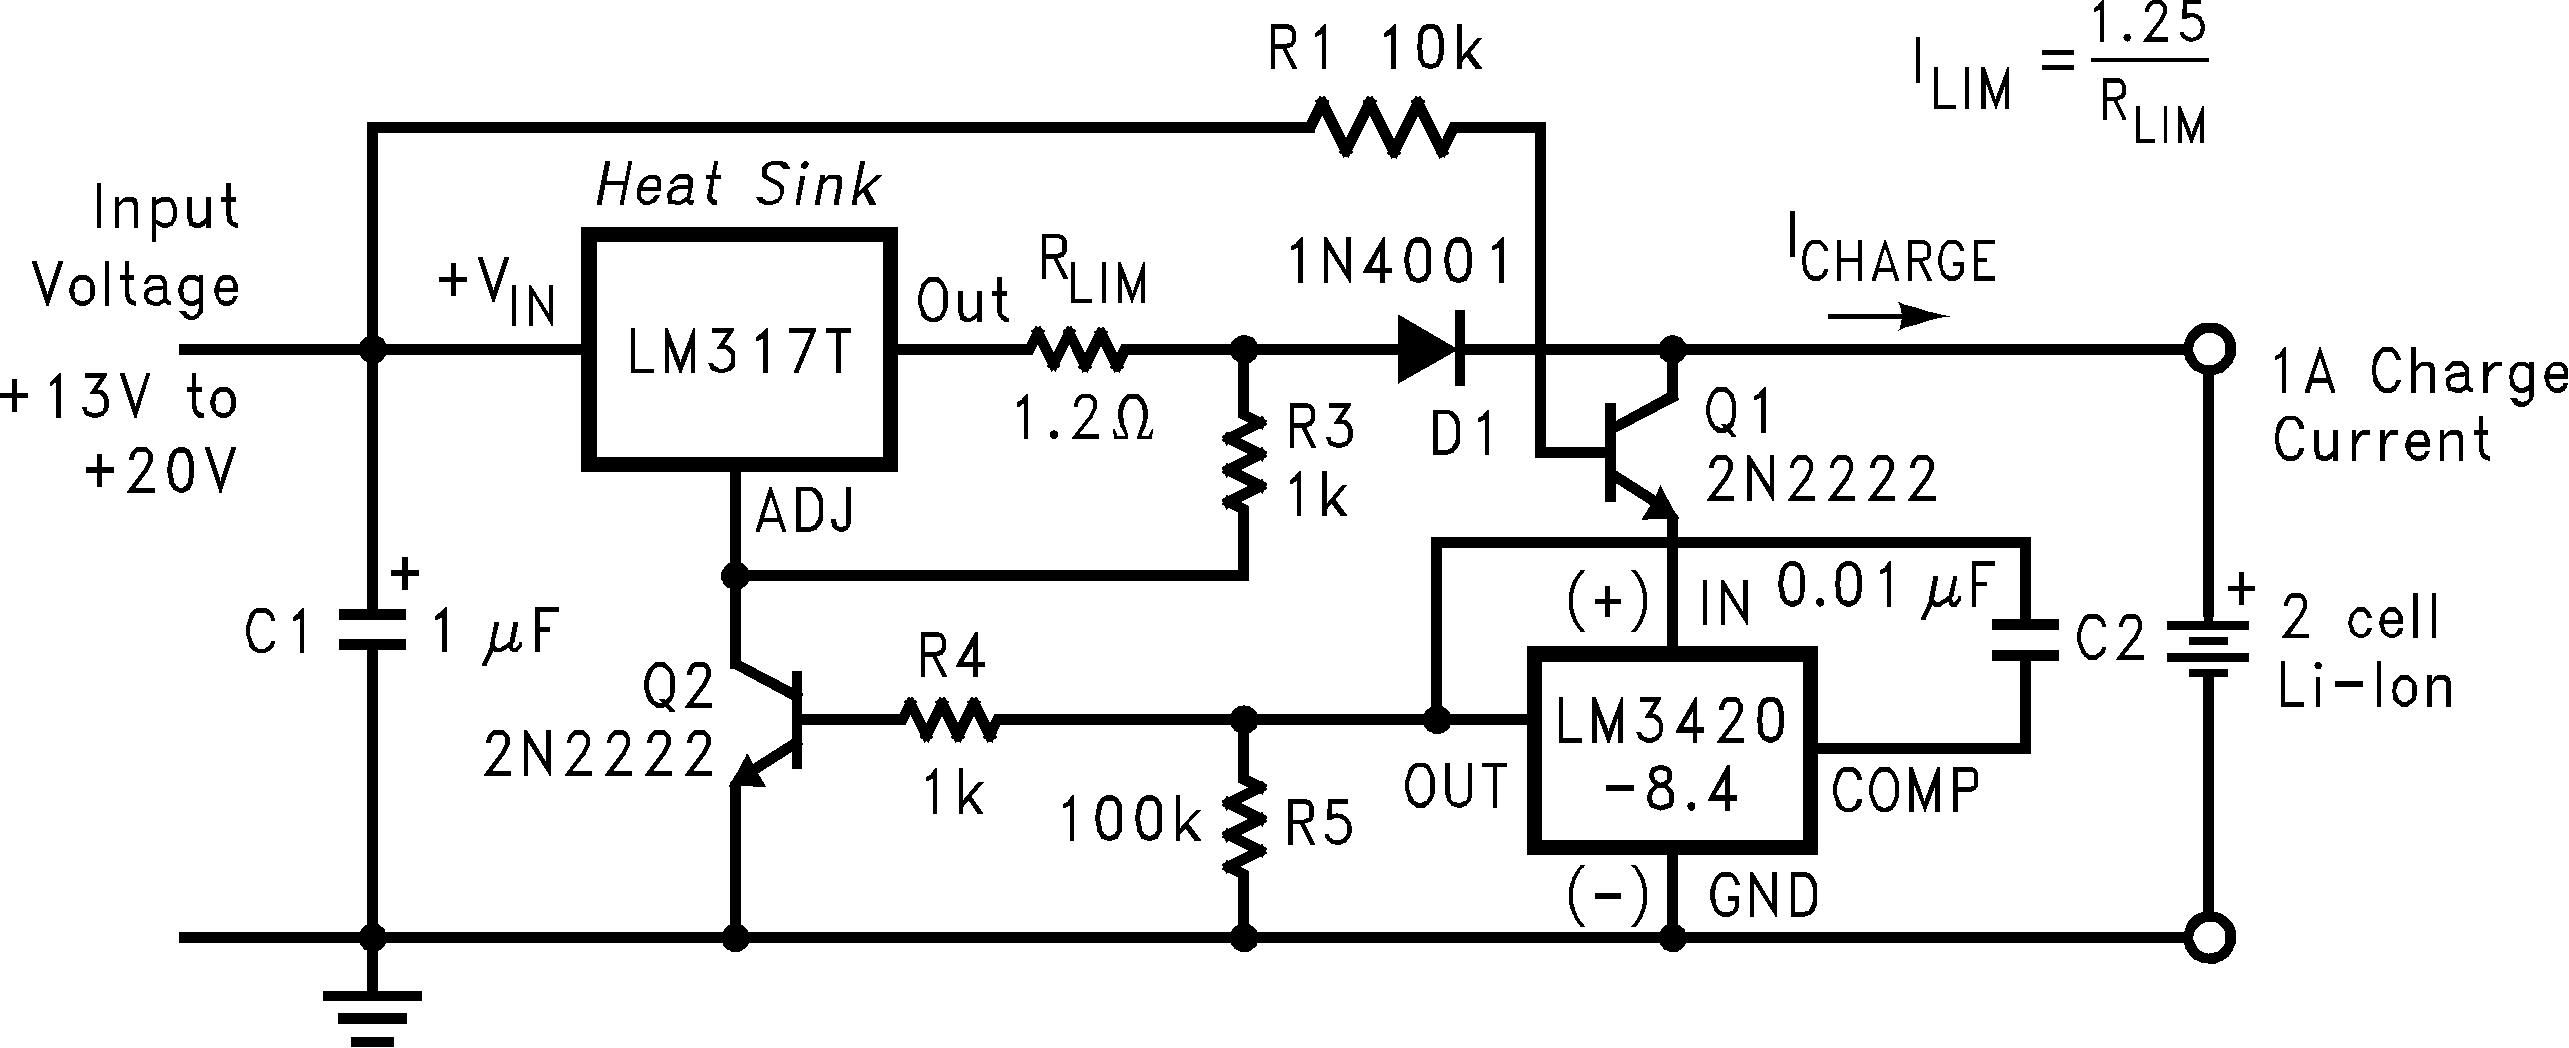 Lm3420 Transistor Regulator Circuit Can Adjustable Output Voltage 01235901